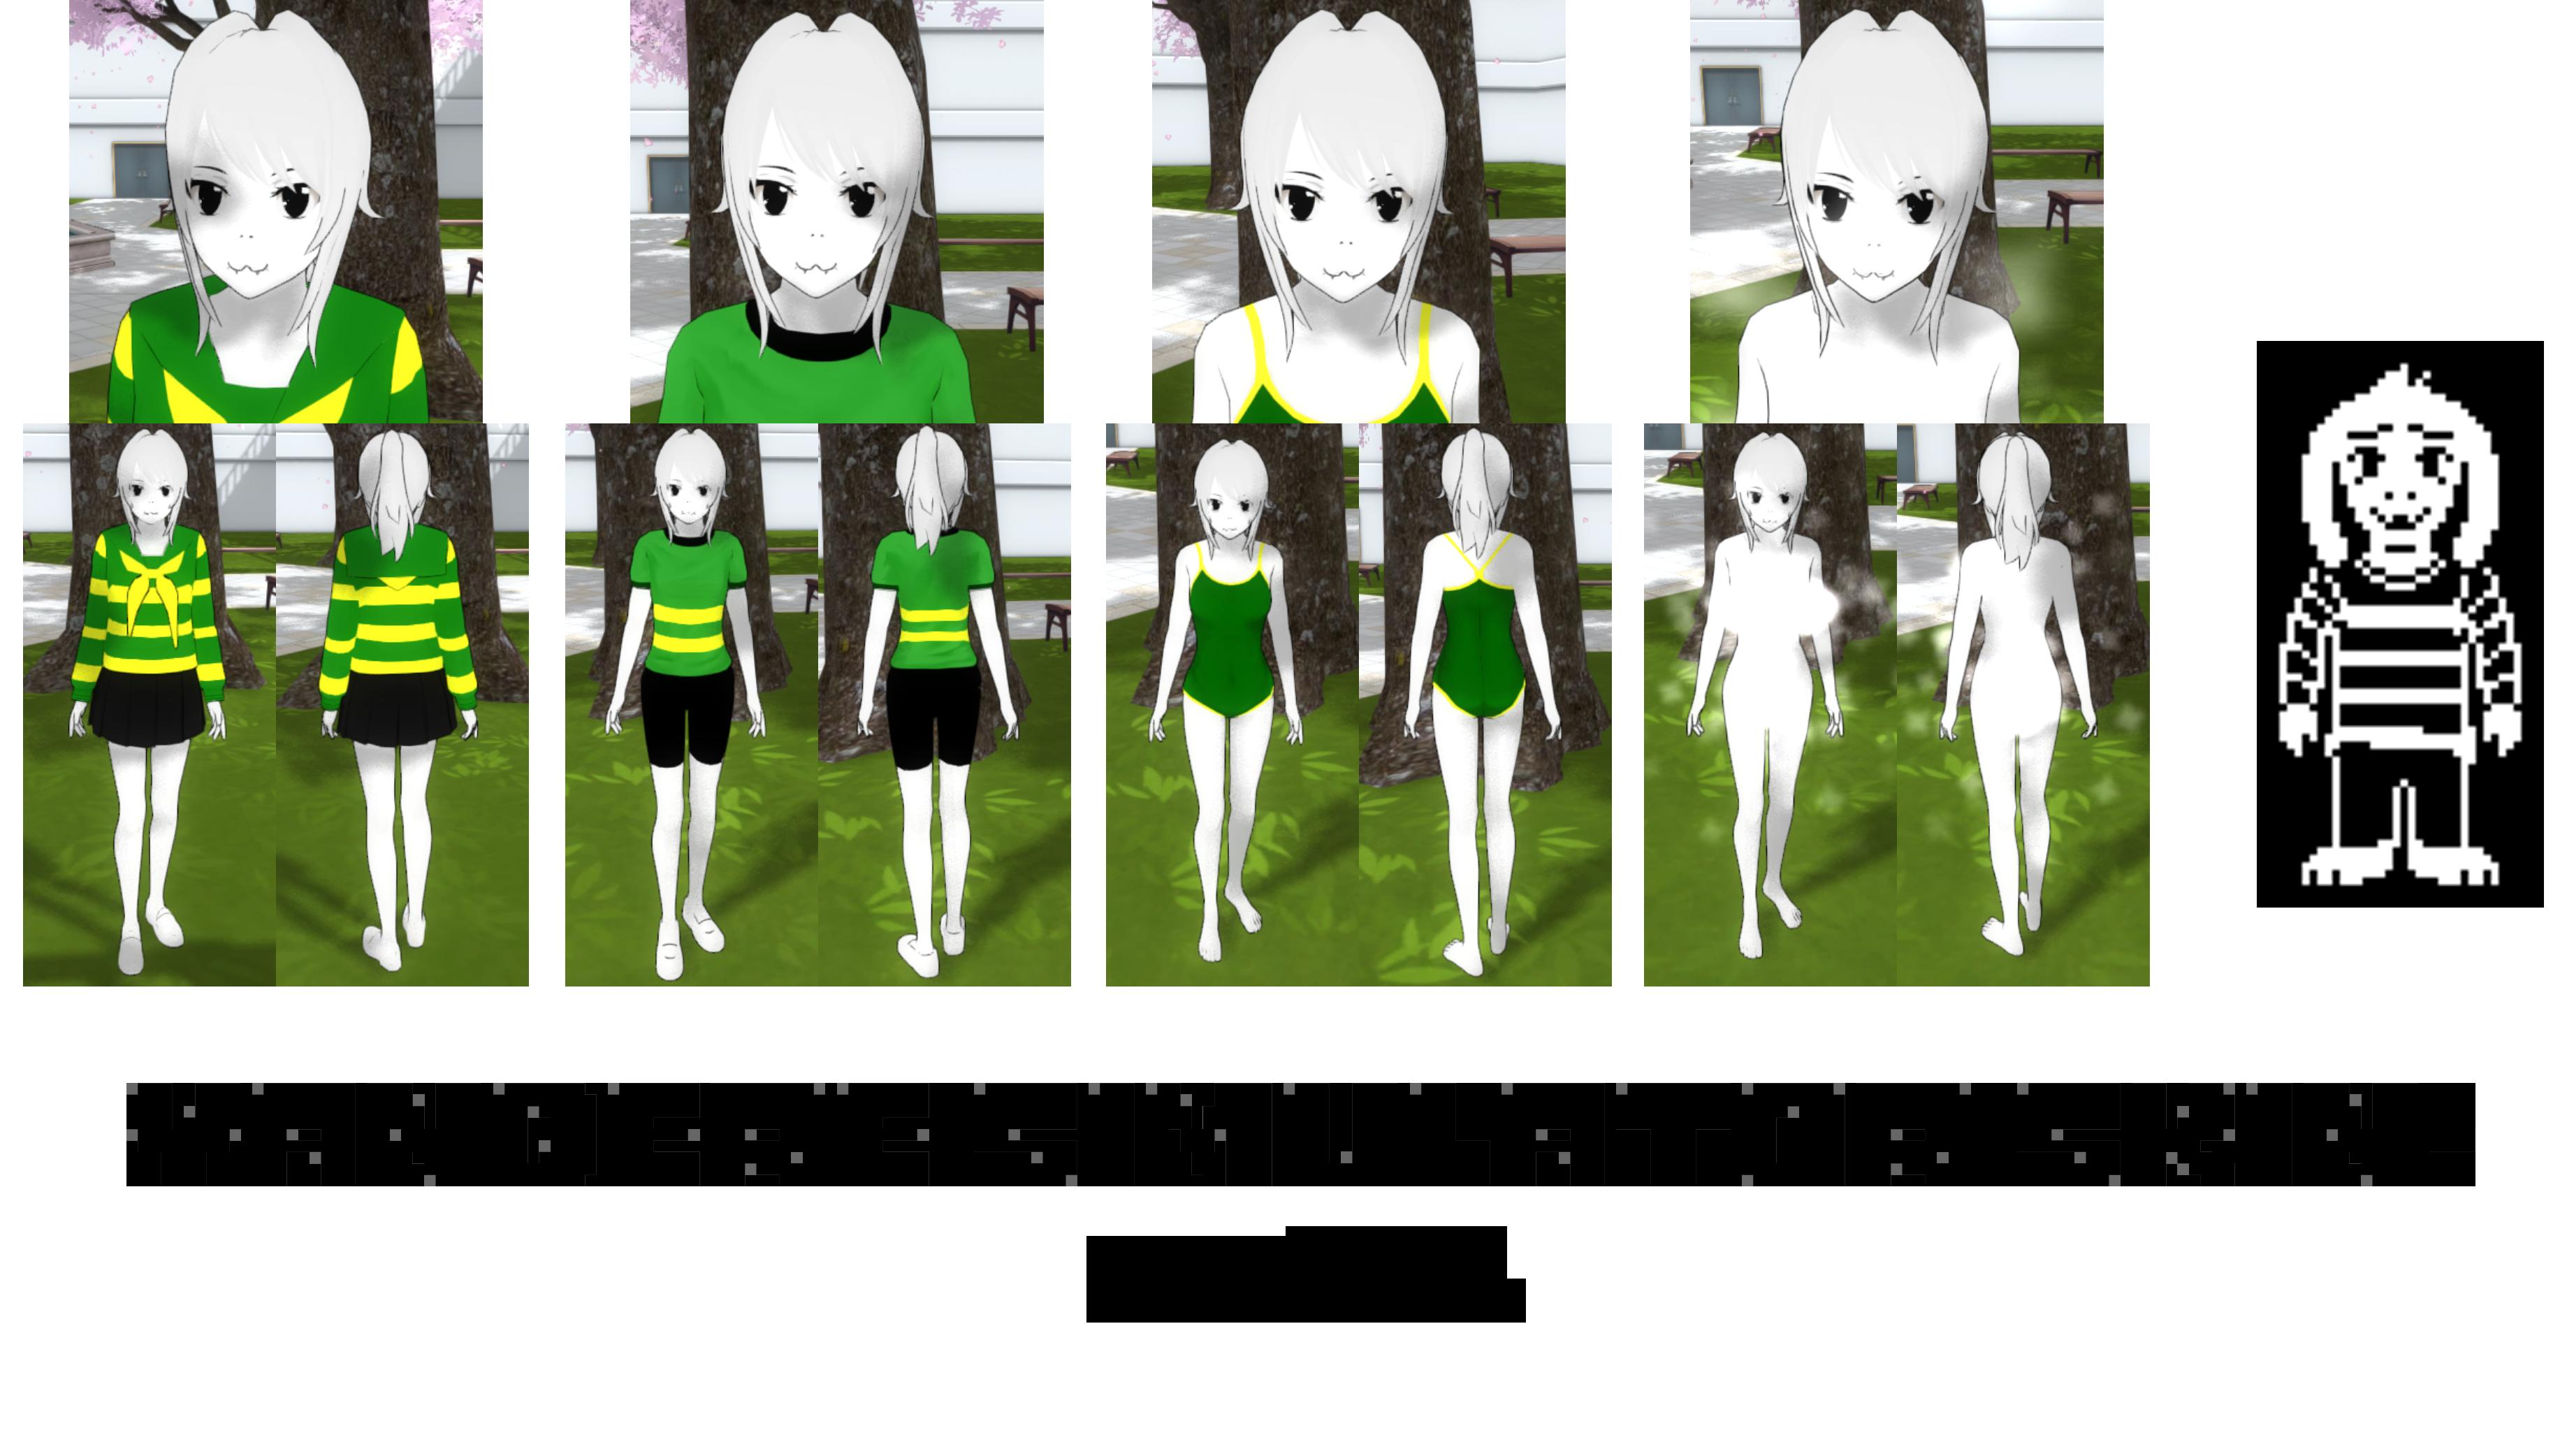 Как скачать яндере симулятор || download yandere simulator youtube.